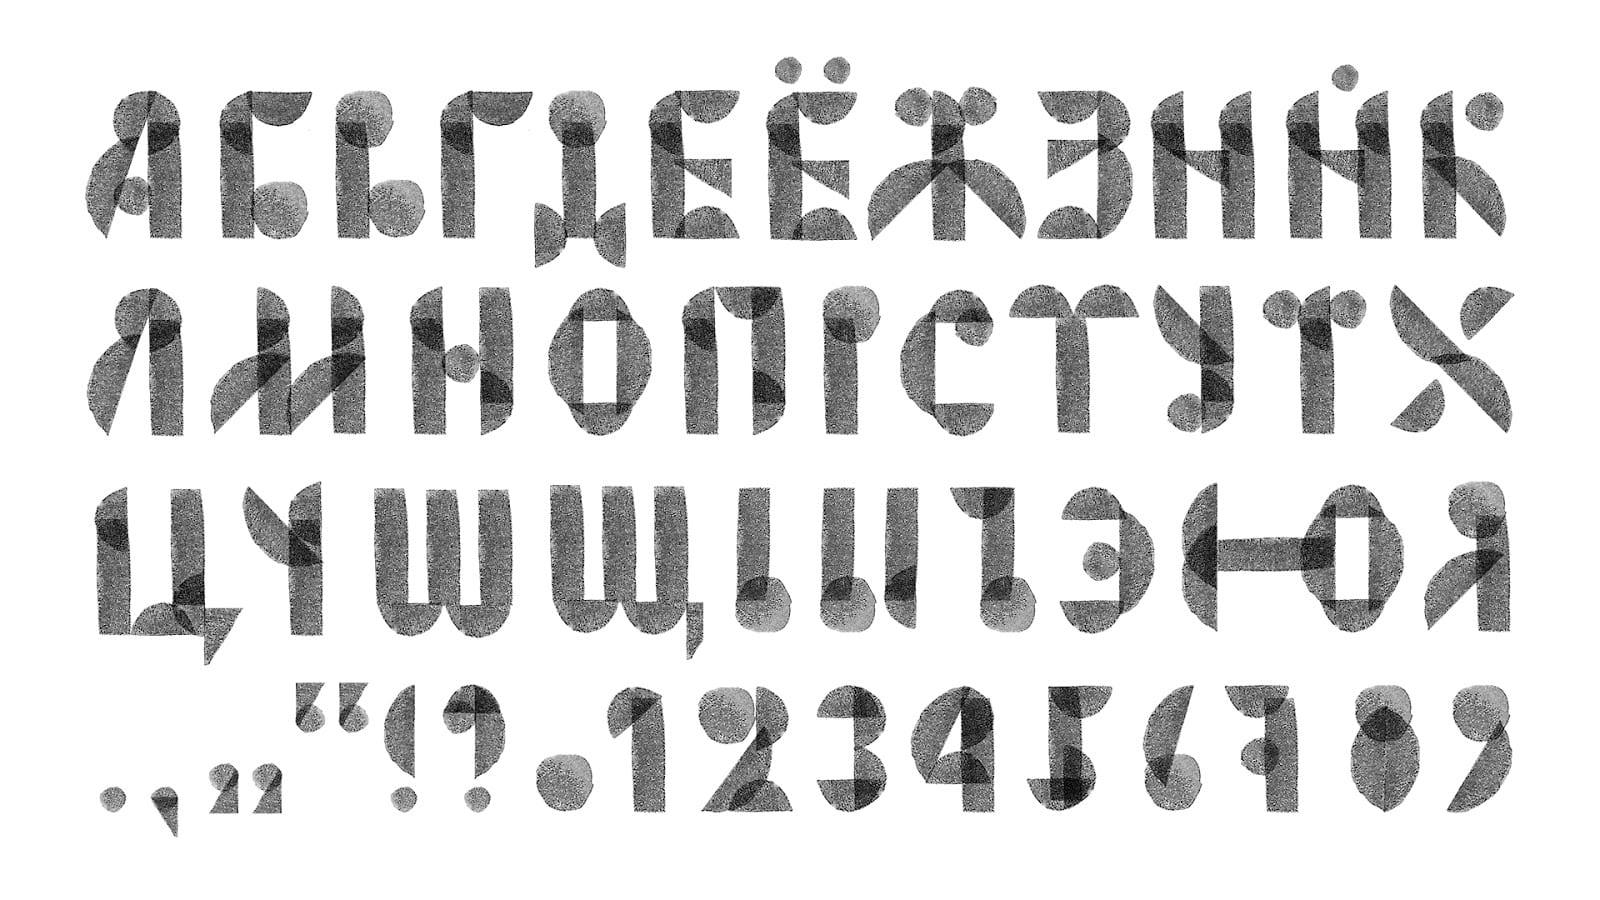 zhatva project 03 - Ach, tie obaly – Zhatva